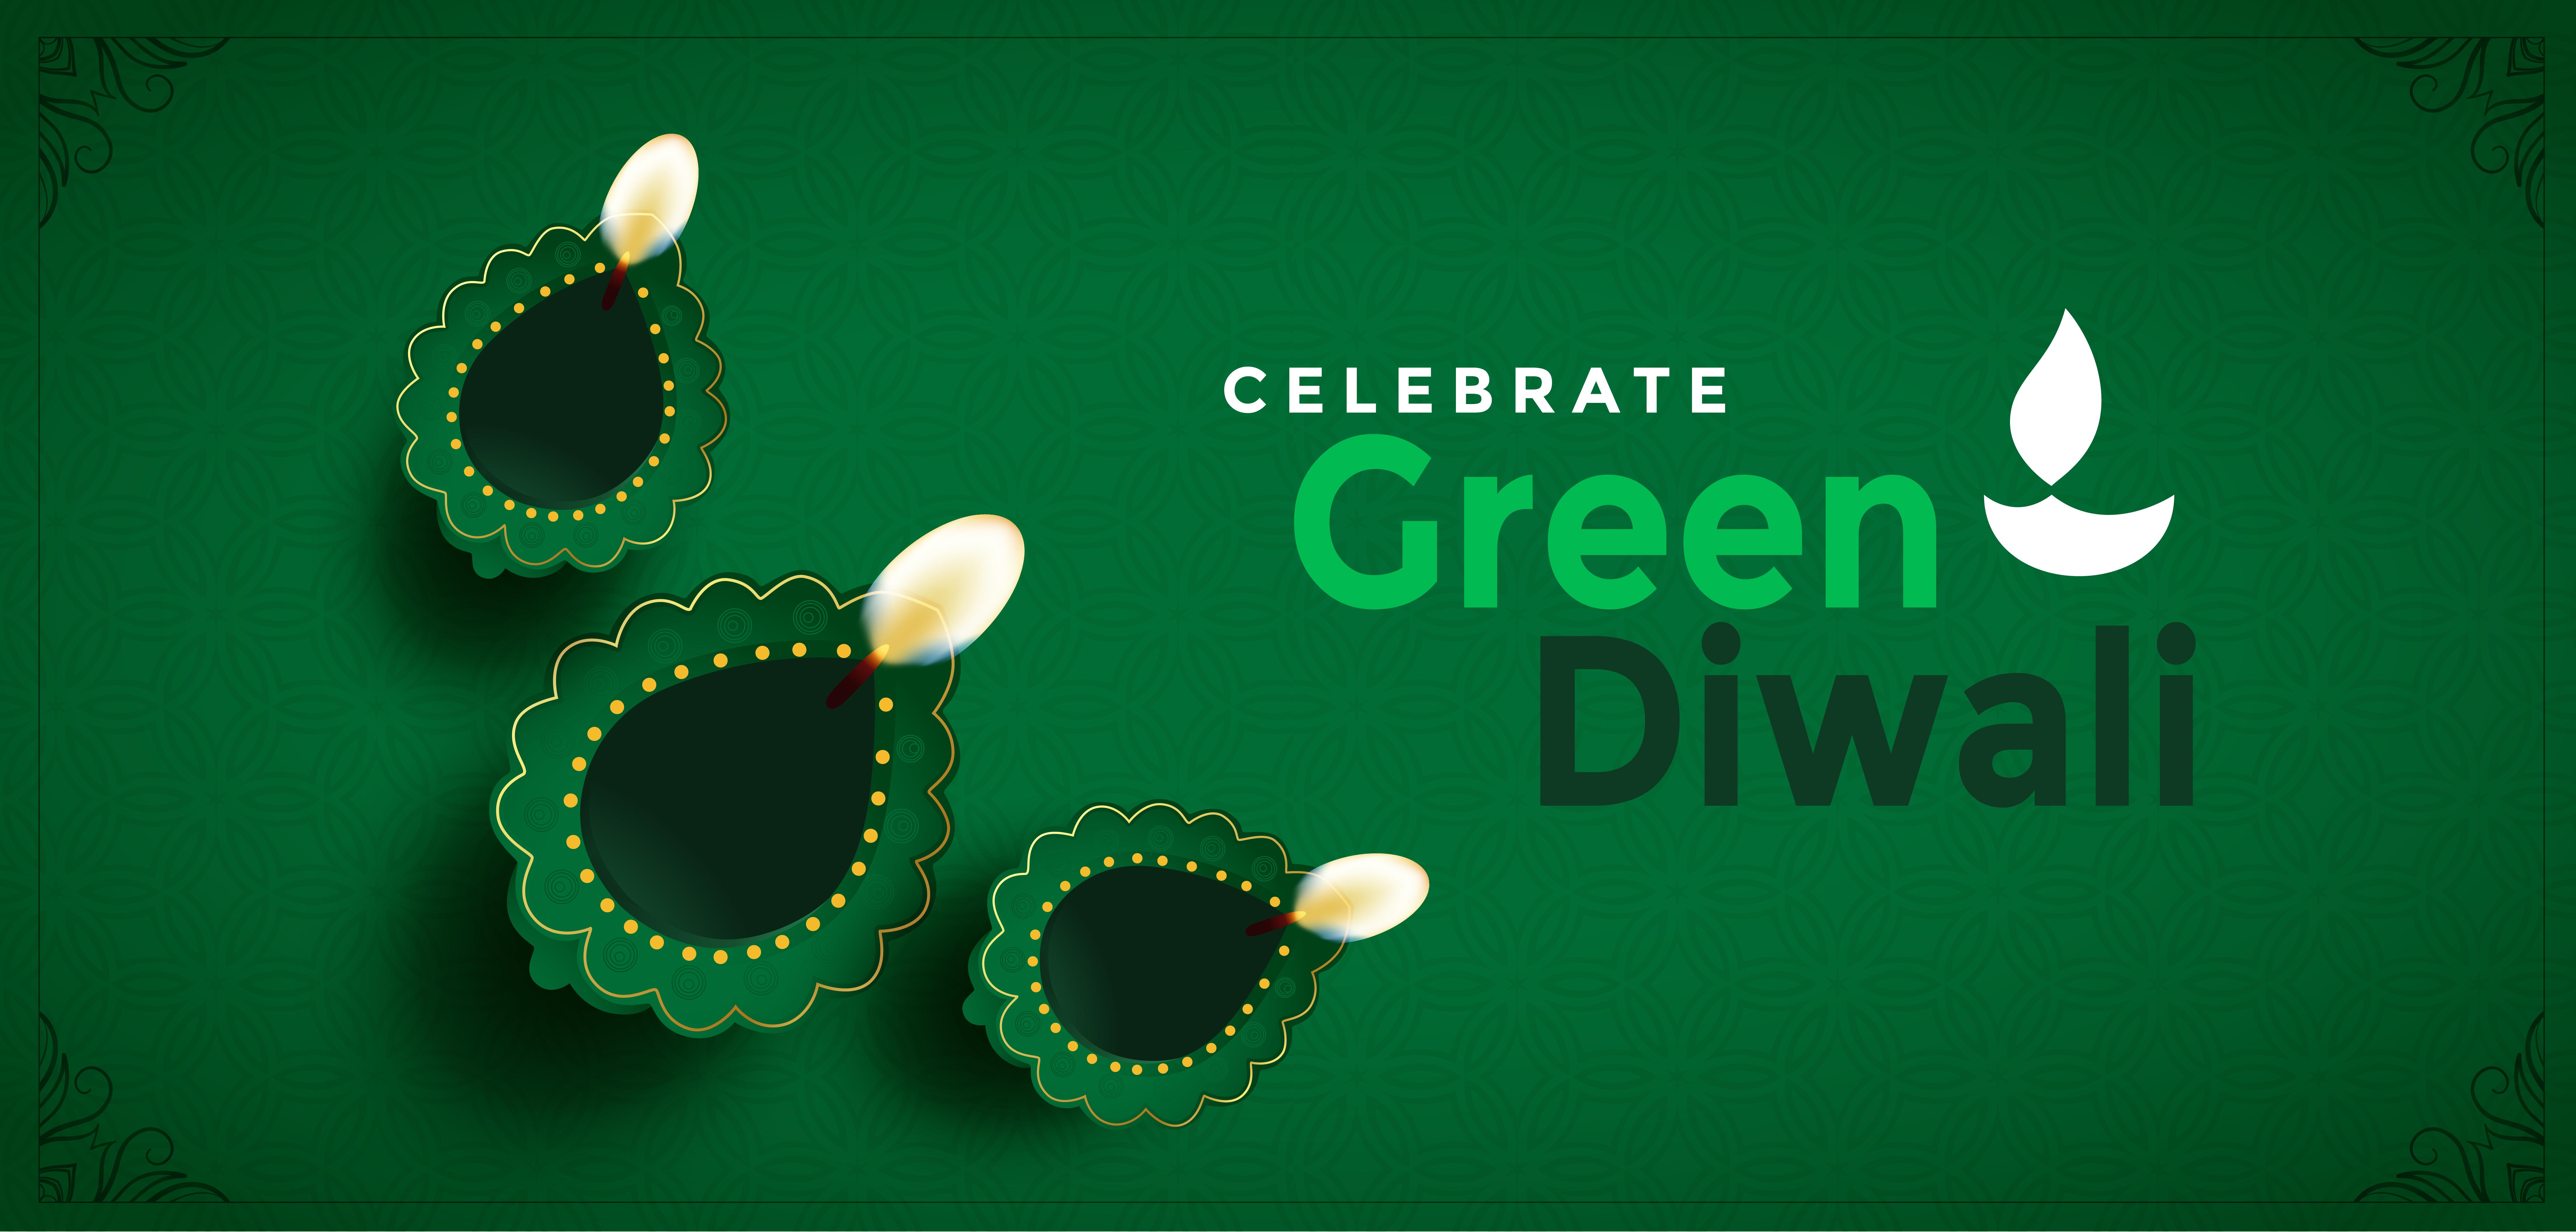 Green Diwali! Clean Diwali